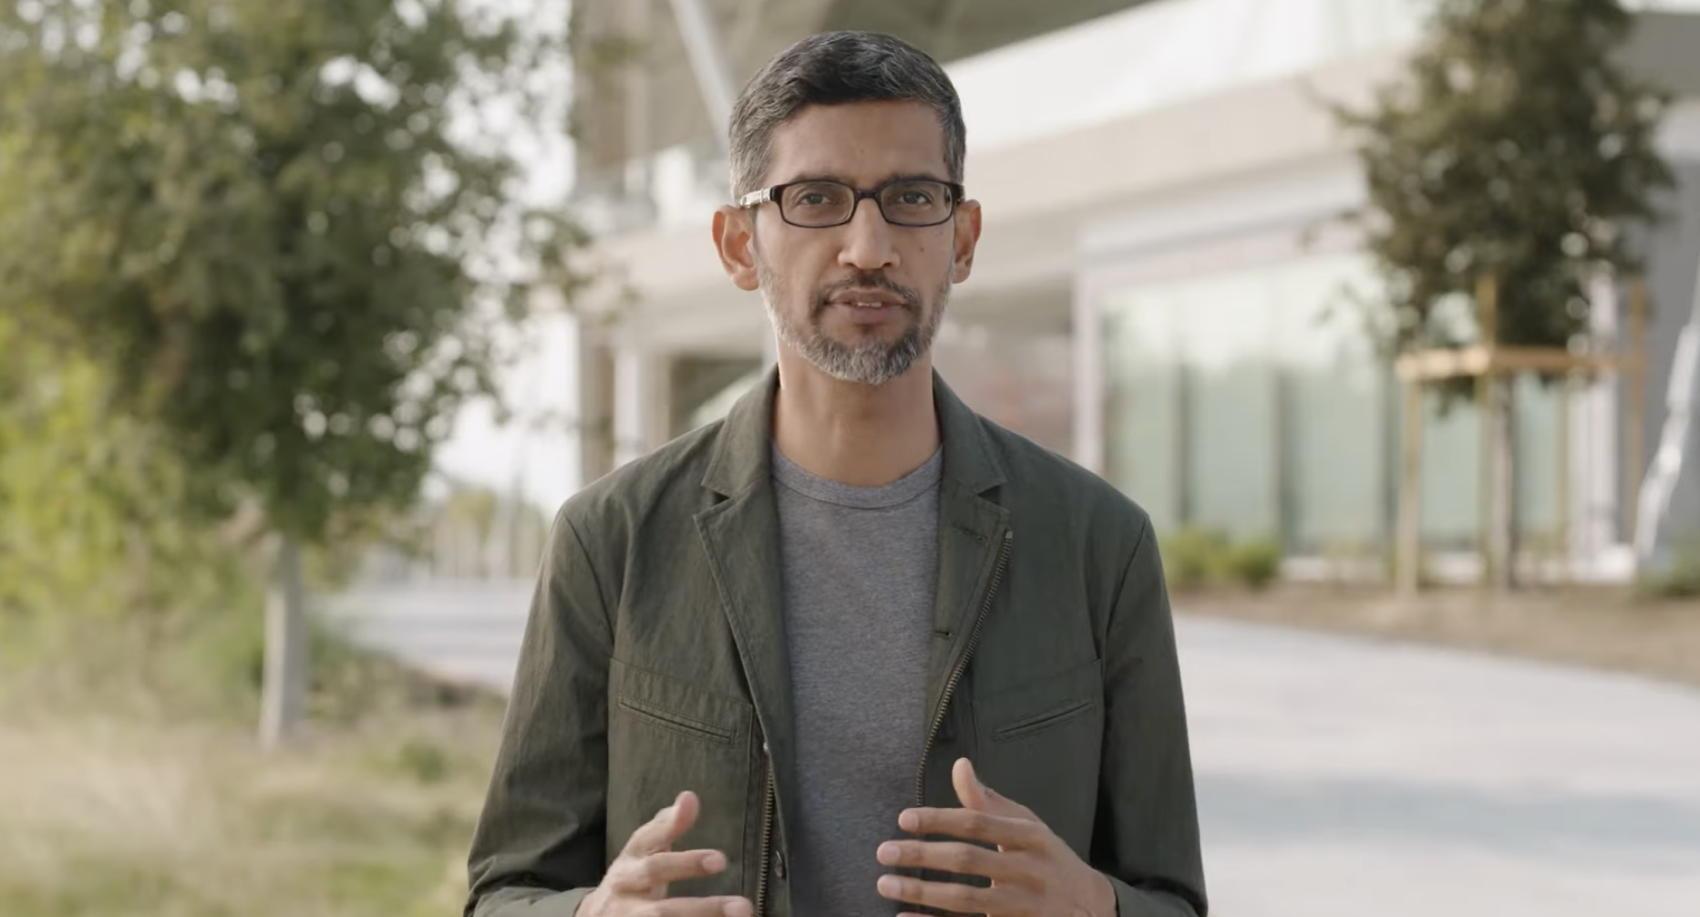 Google CEO Sundar Pichai - Google for Africa